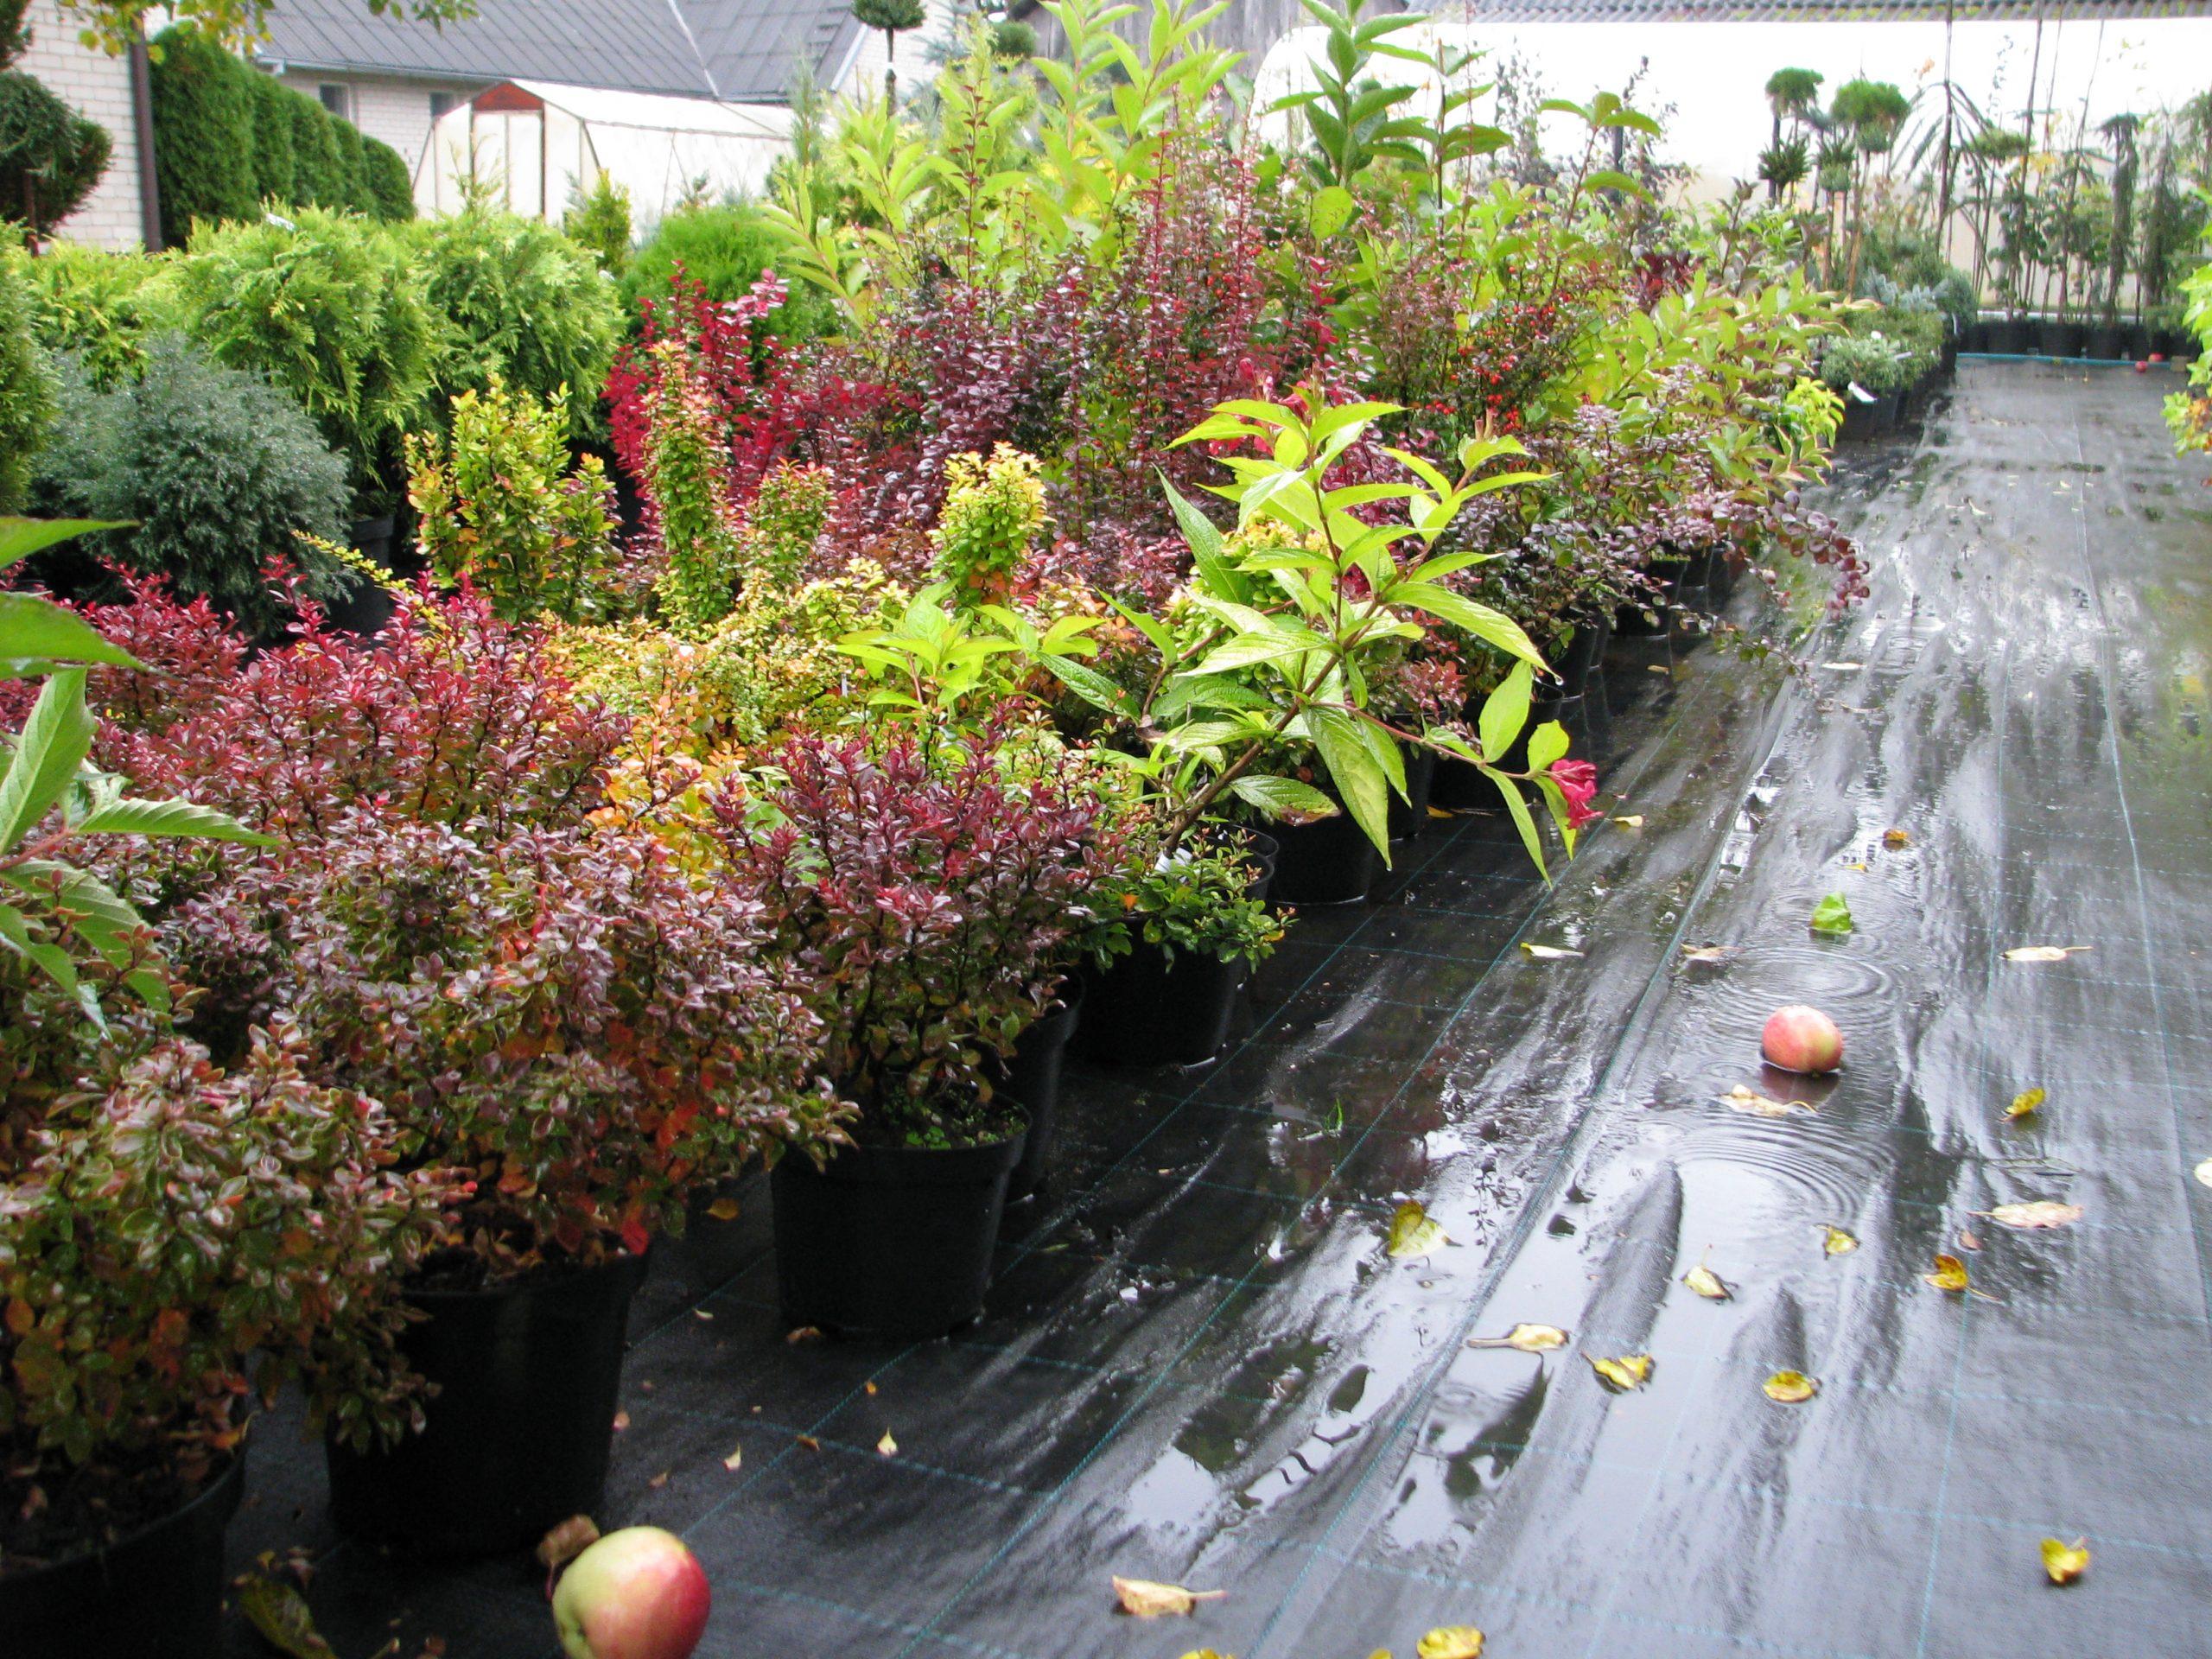 Augalai medelyno prekybos aikštelėje